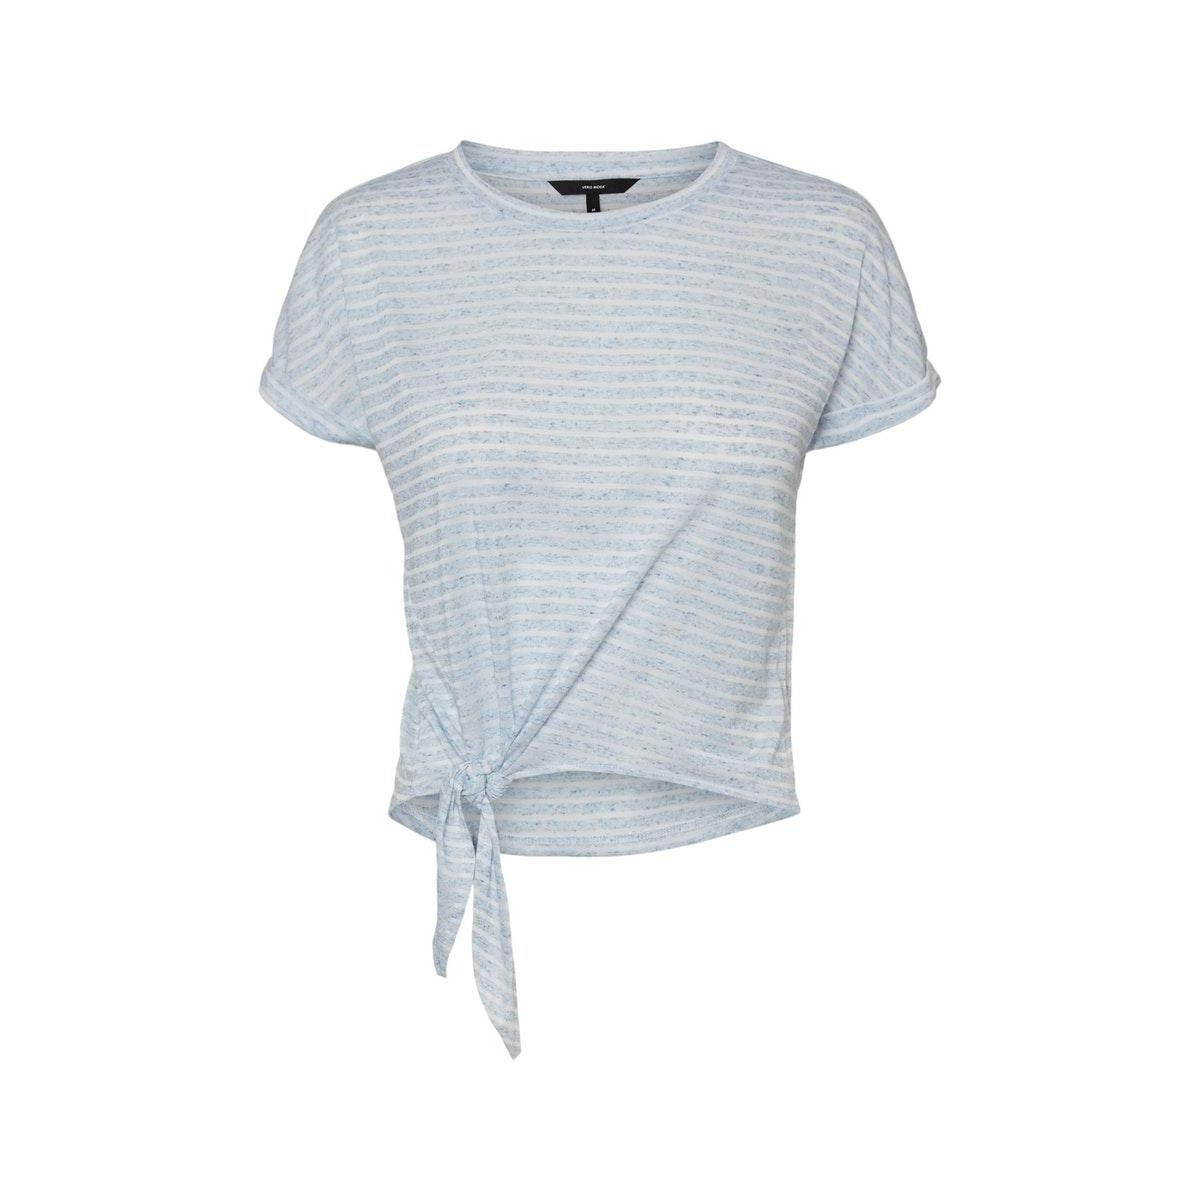 vmrakel ss top jrs 10230828 vero moda t-shirt birch/placid blue